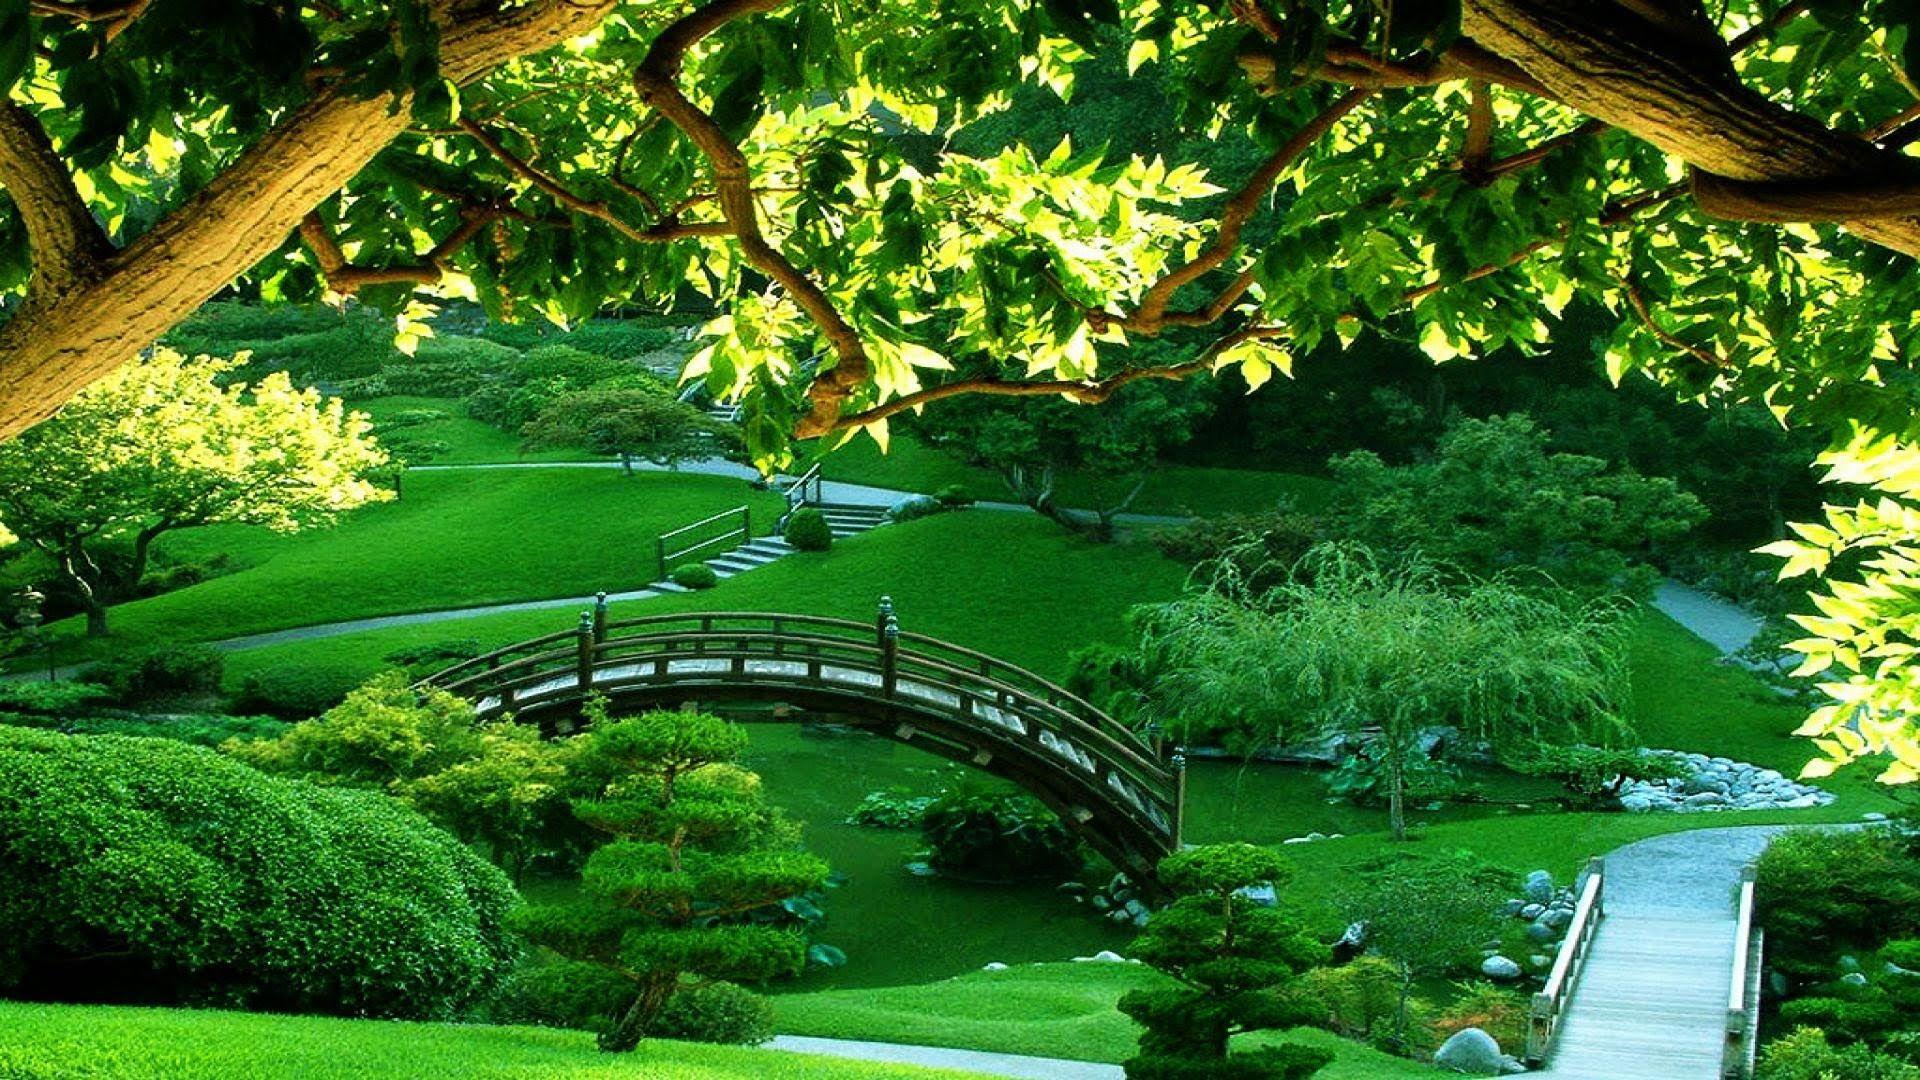 3 Hours Meditation Relaxing Music Bamboo Flute Background Spa Japanese Garden Beautiful Gardens Green Garden